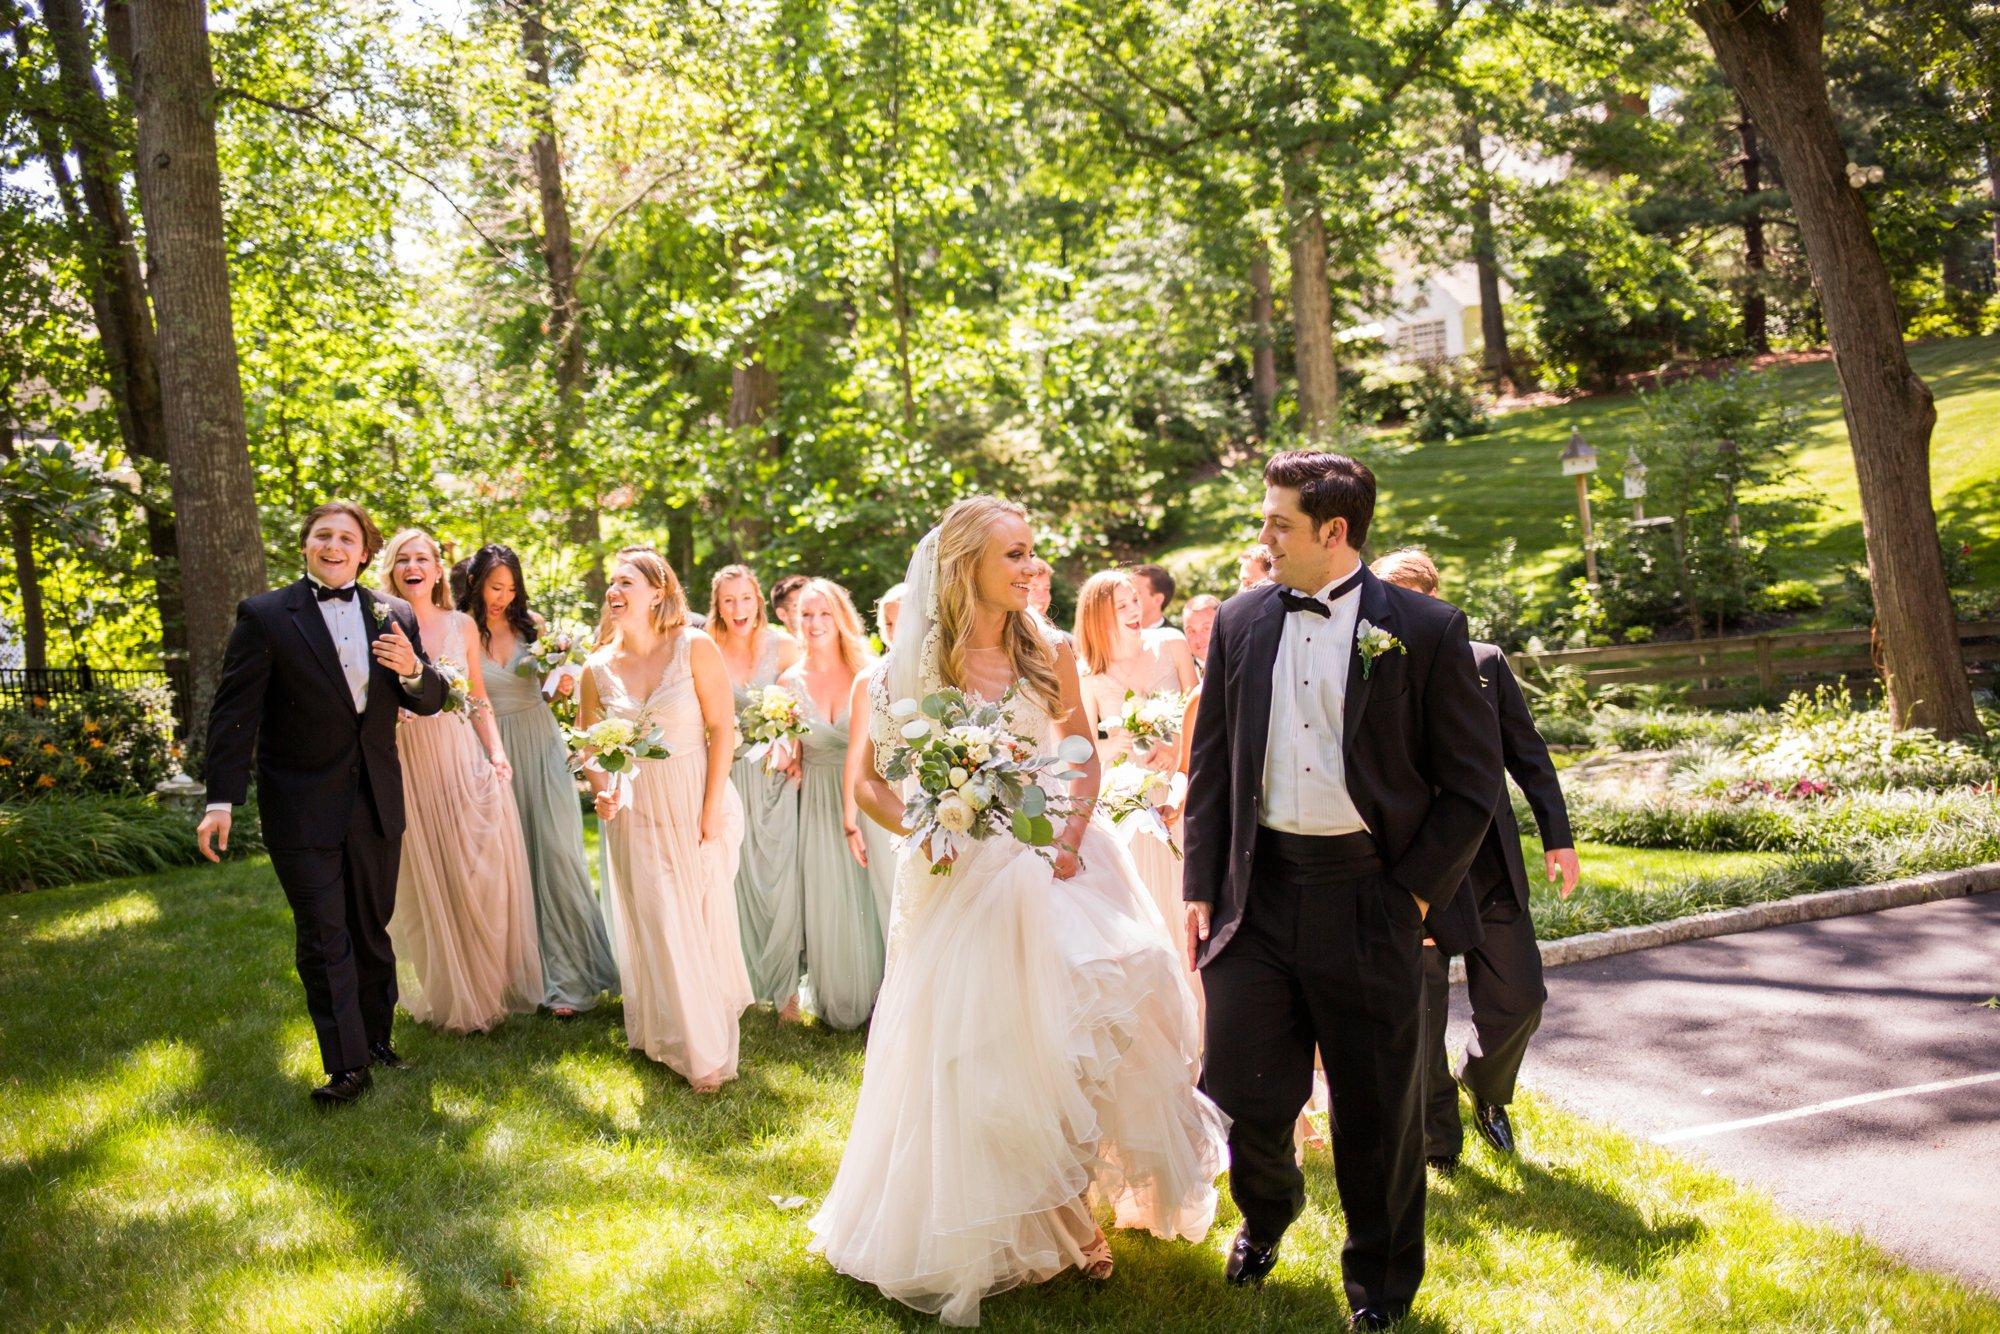 wedding-photography-88-love-stories_0022.jpg